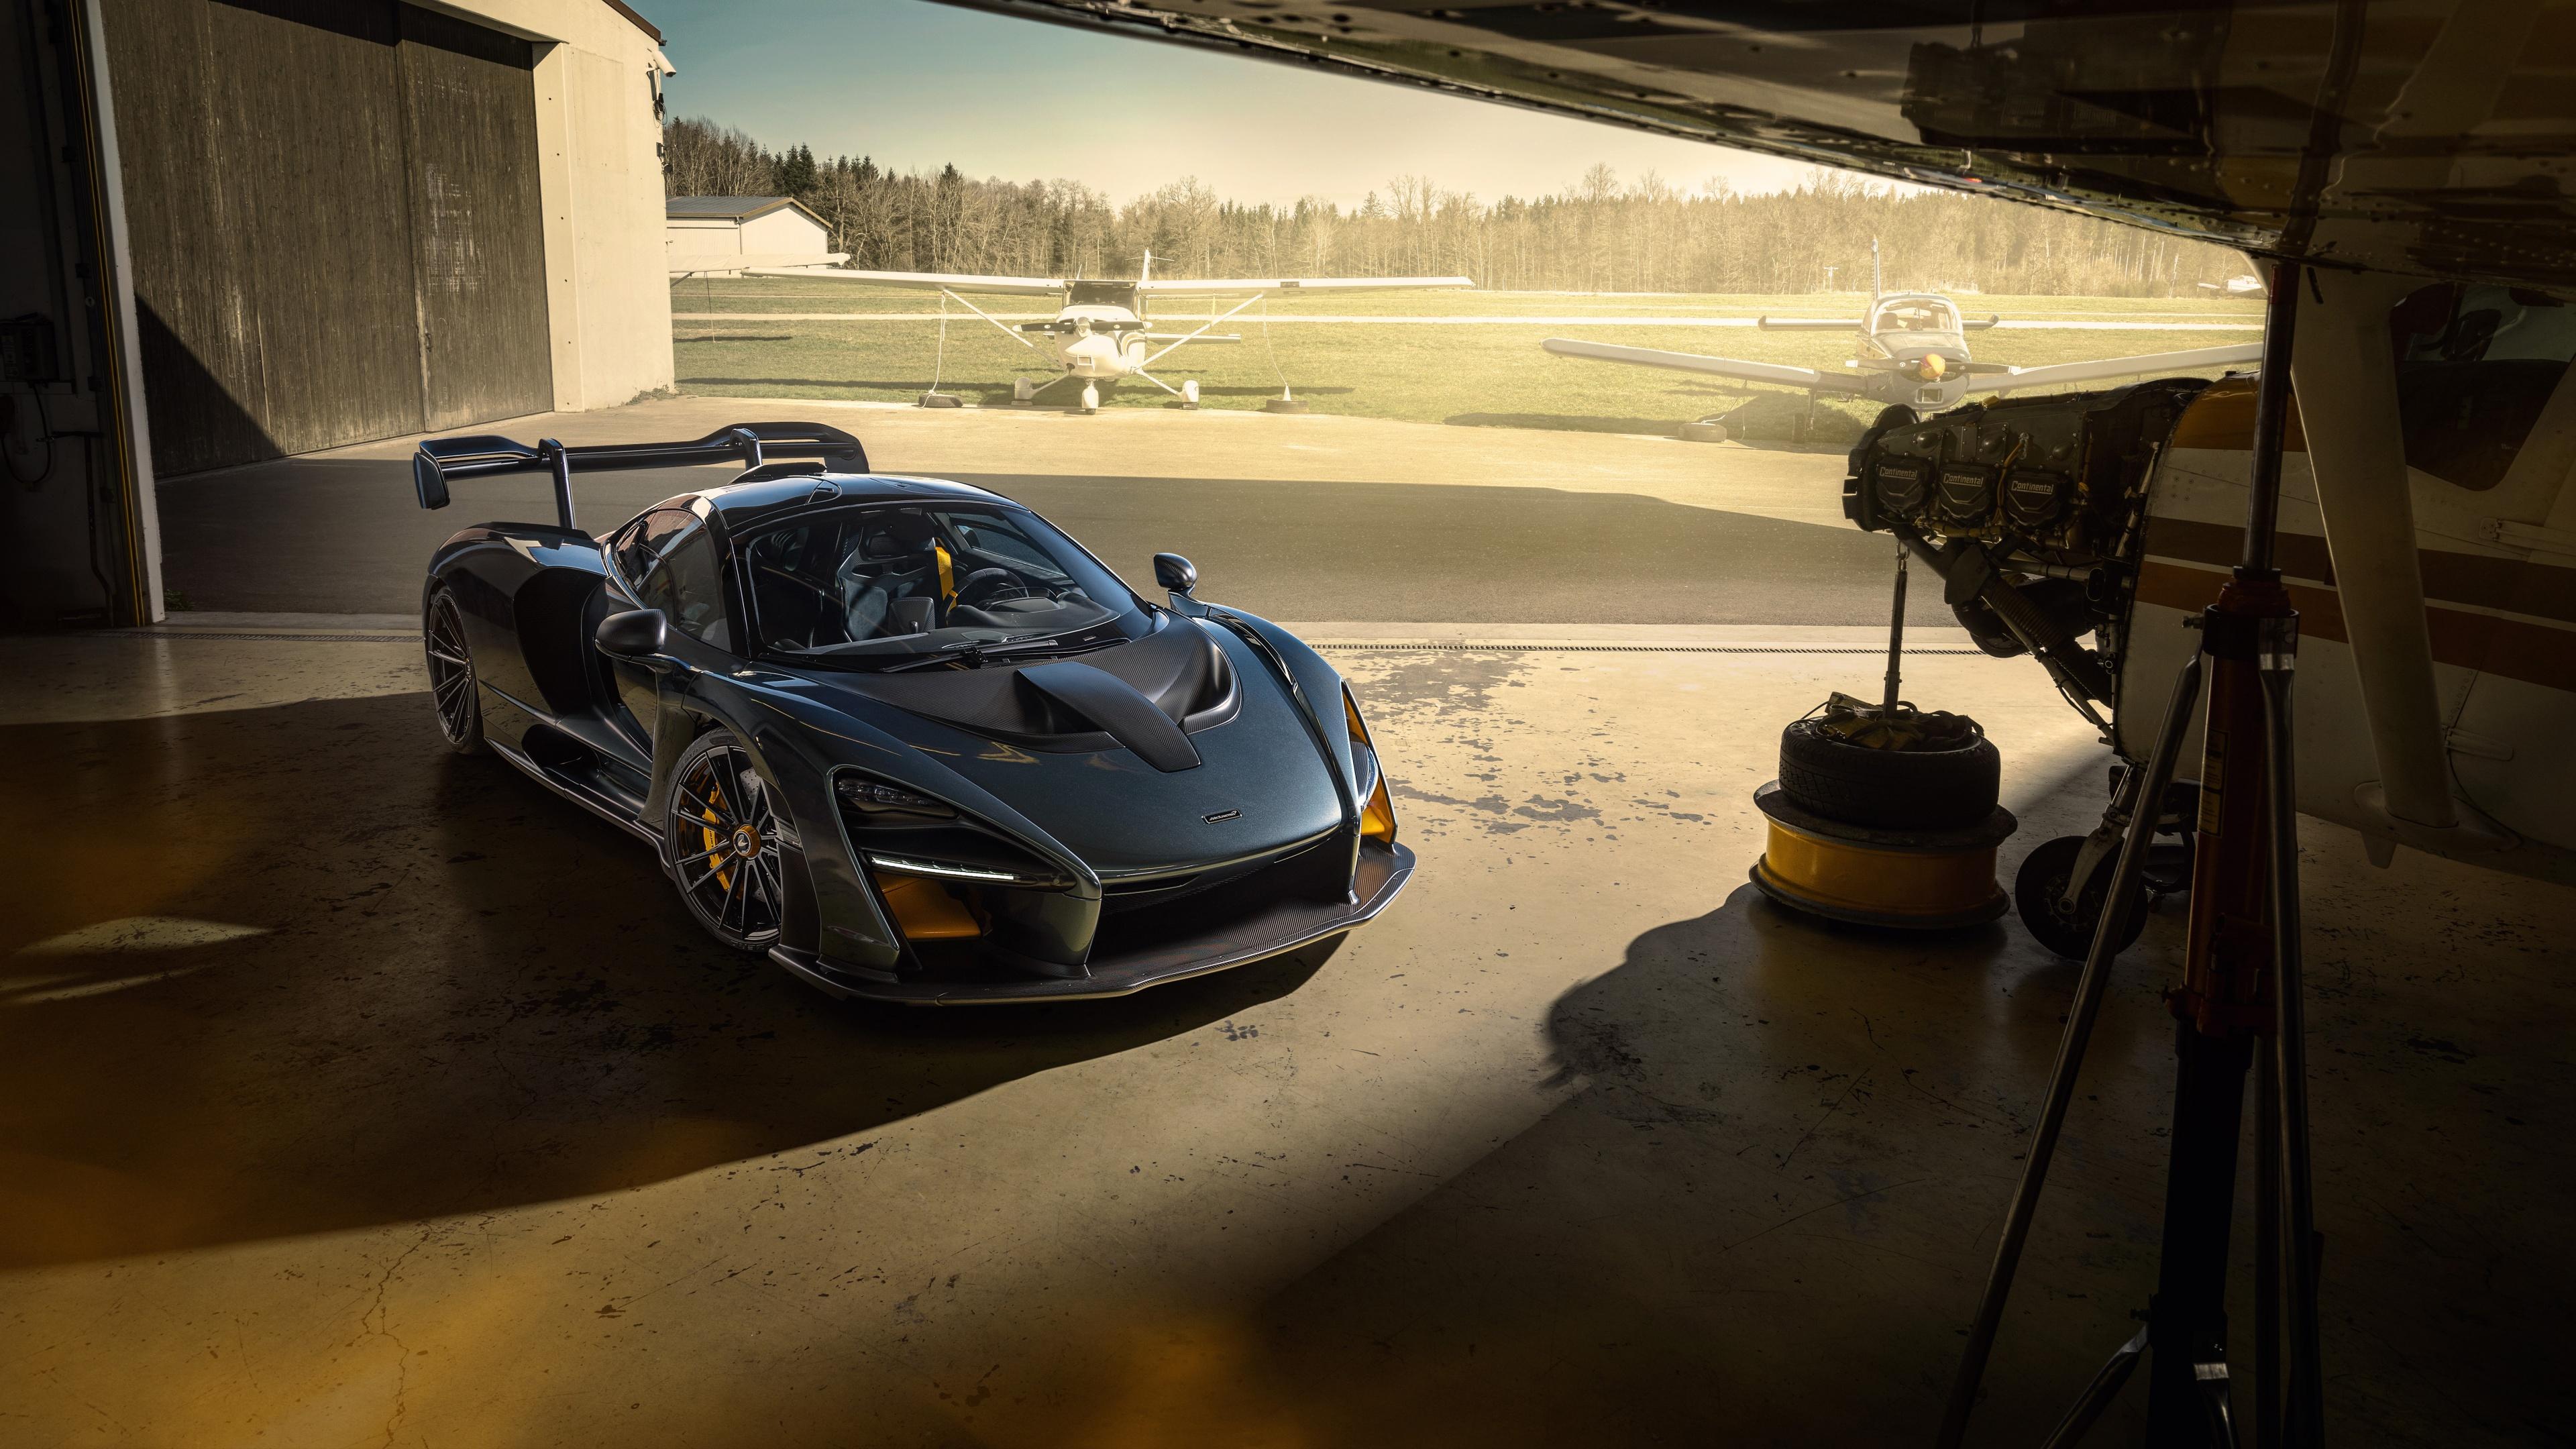 Mclaren Senna 4k Wallpaper Novitec 2020 5k 8k Cars 243